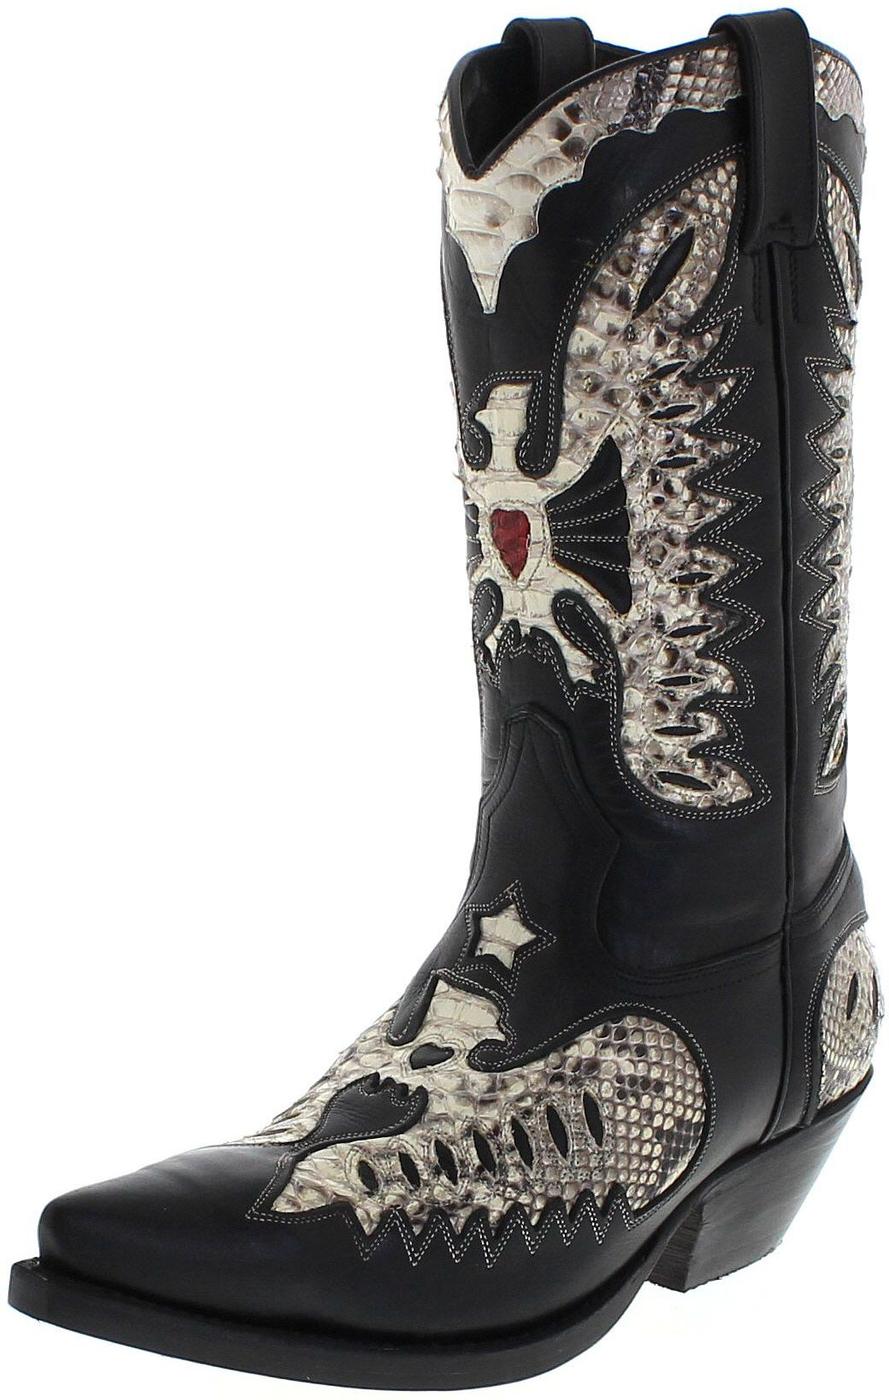 Primeboots 720 Python Black White Exotic boots - black white